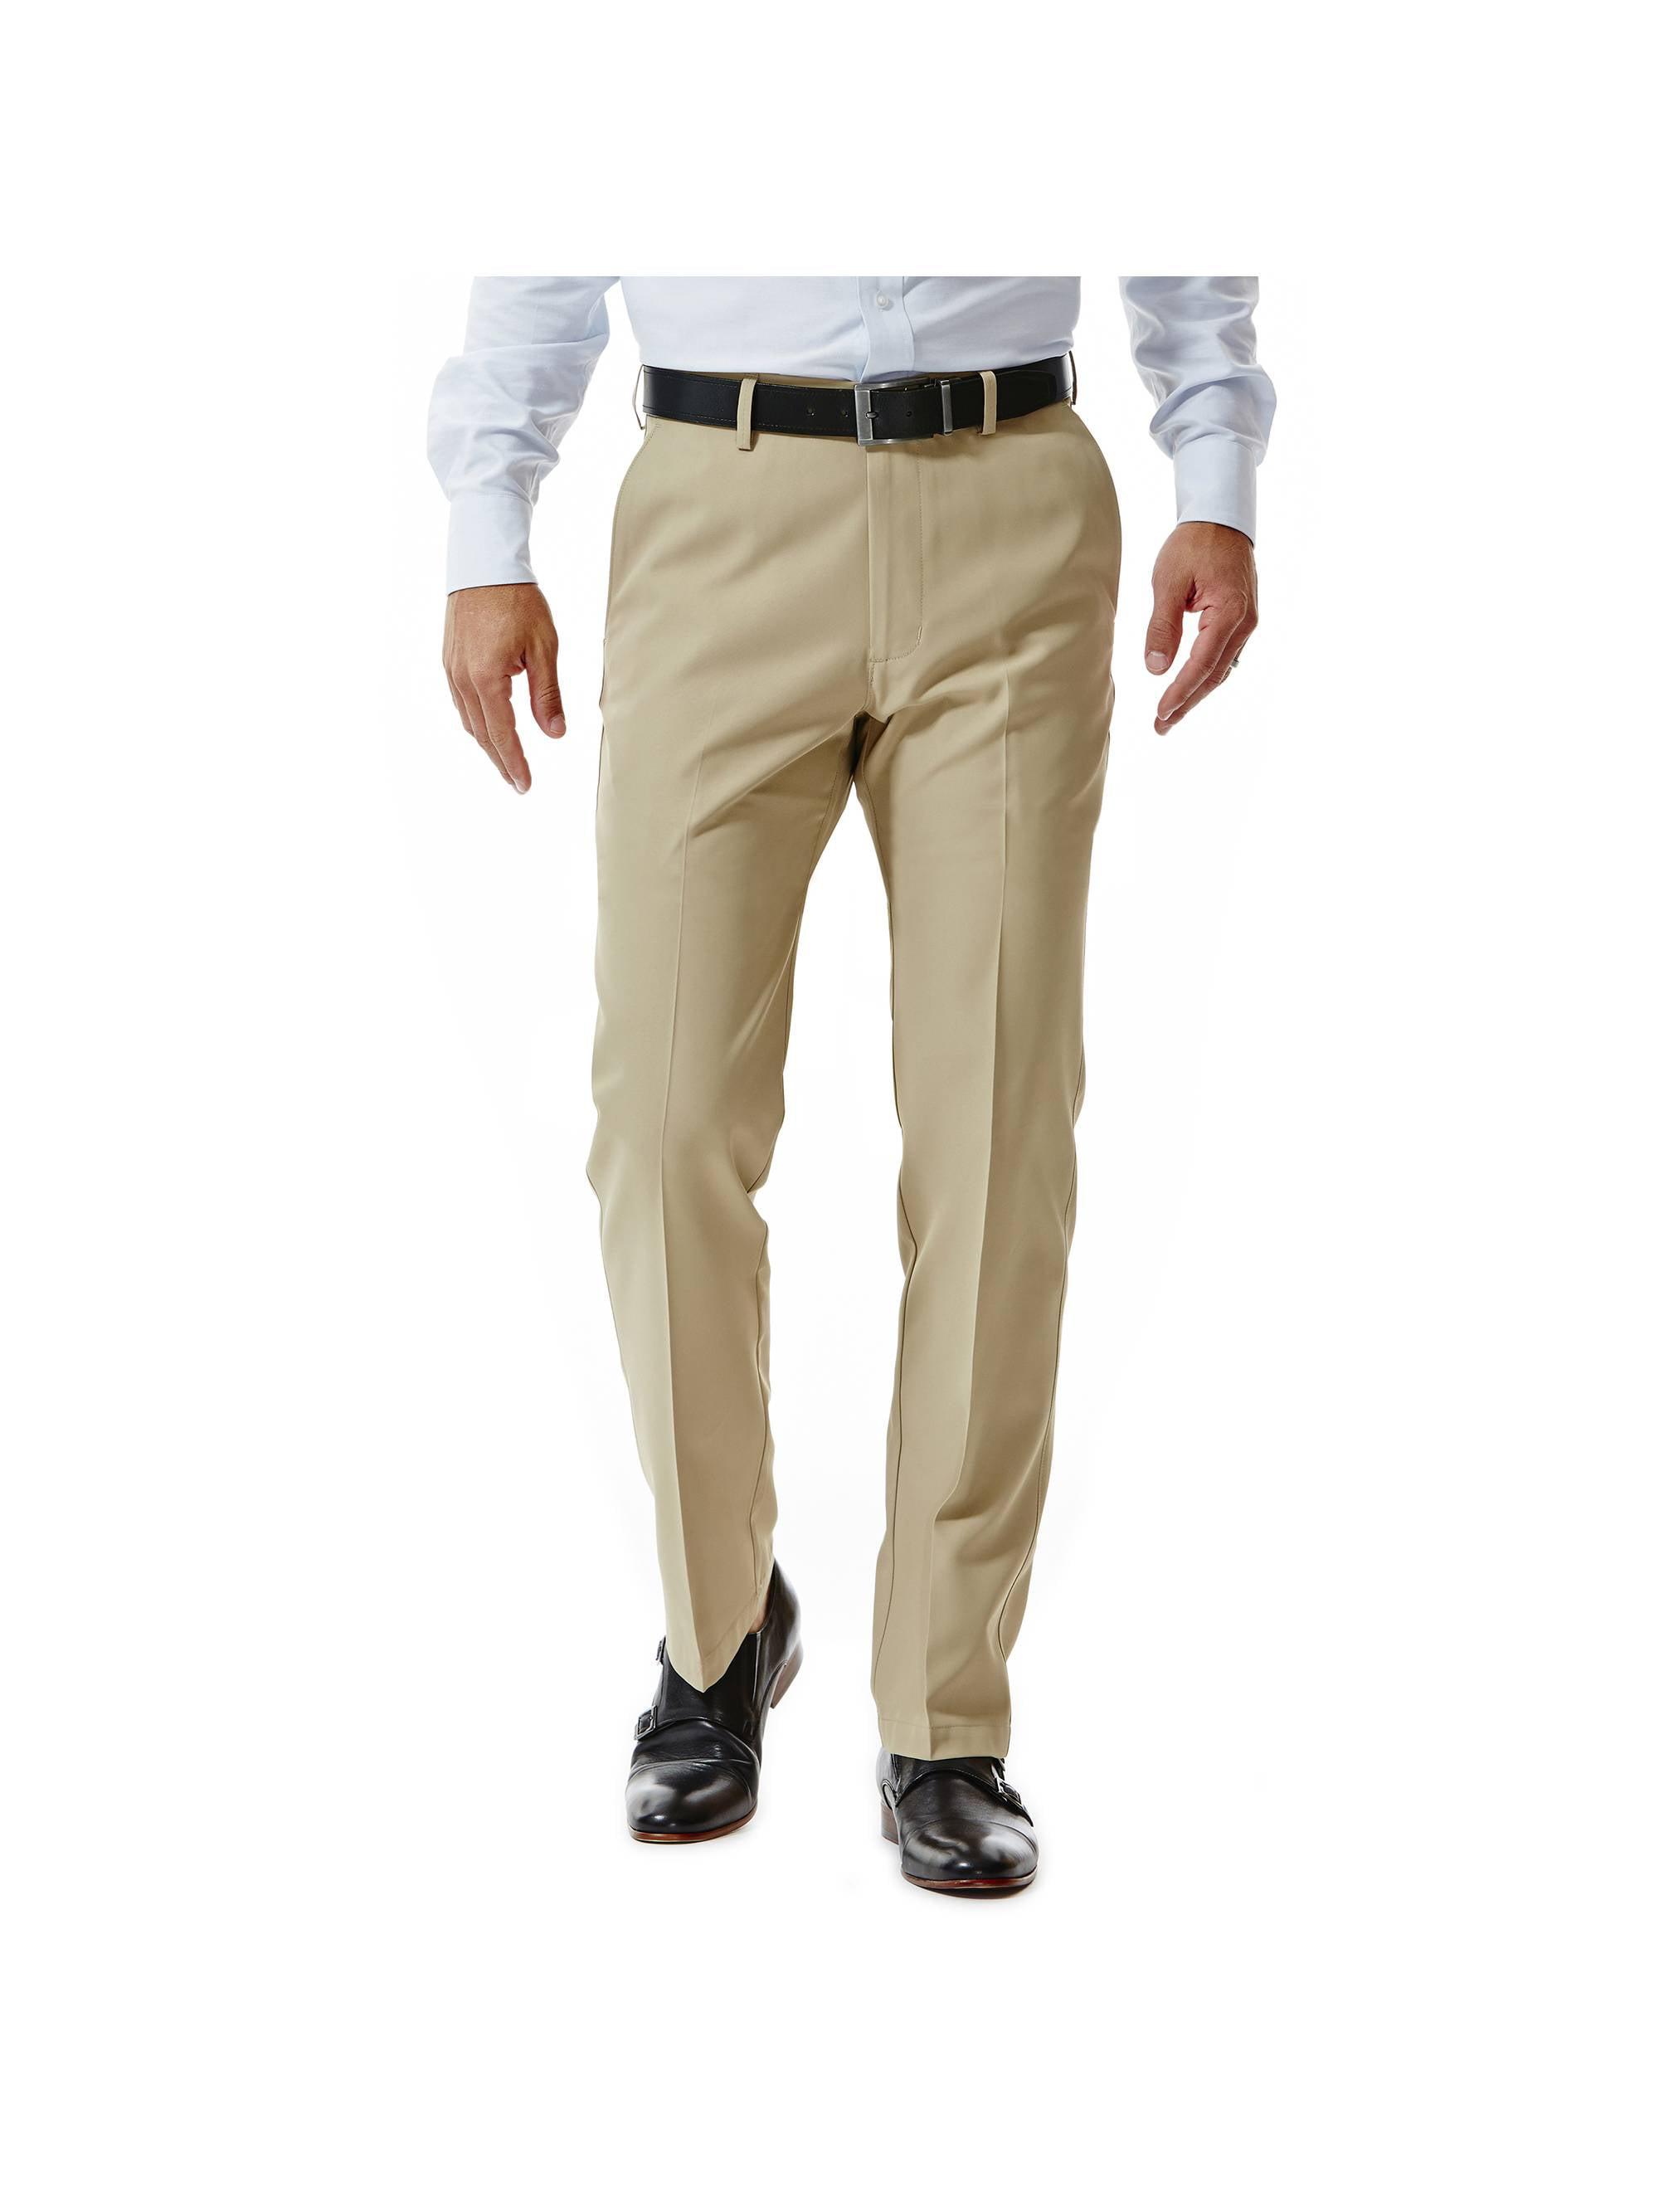 Men's Performance Microfiber Flat Front Pant Straight Fit HC10822